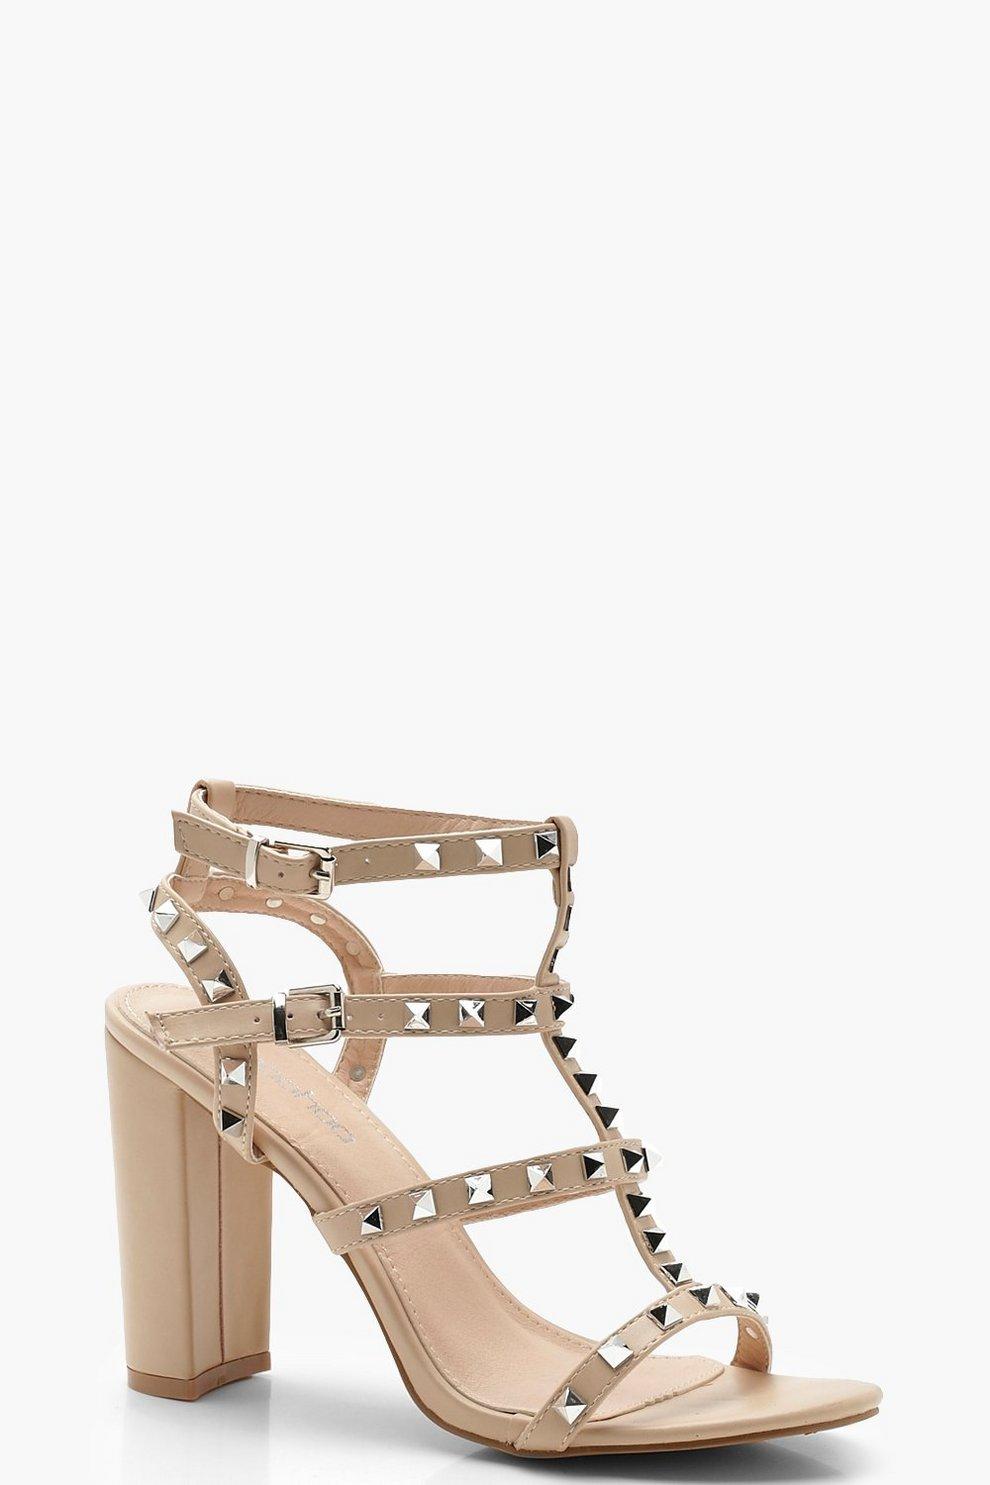 d81450cd1c5 Studded Strappy Block Heels